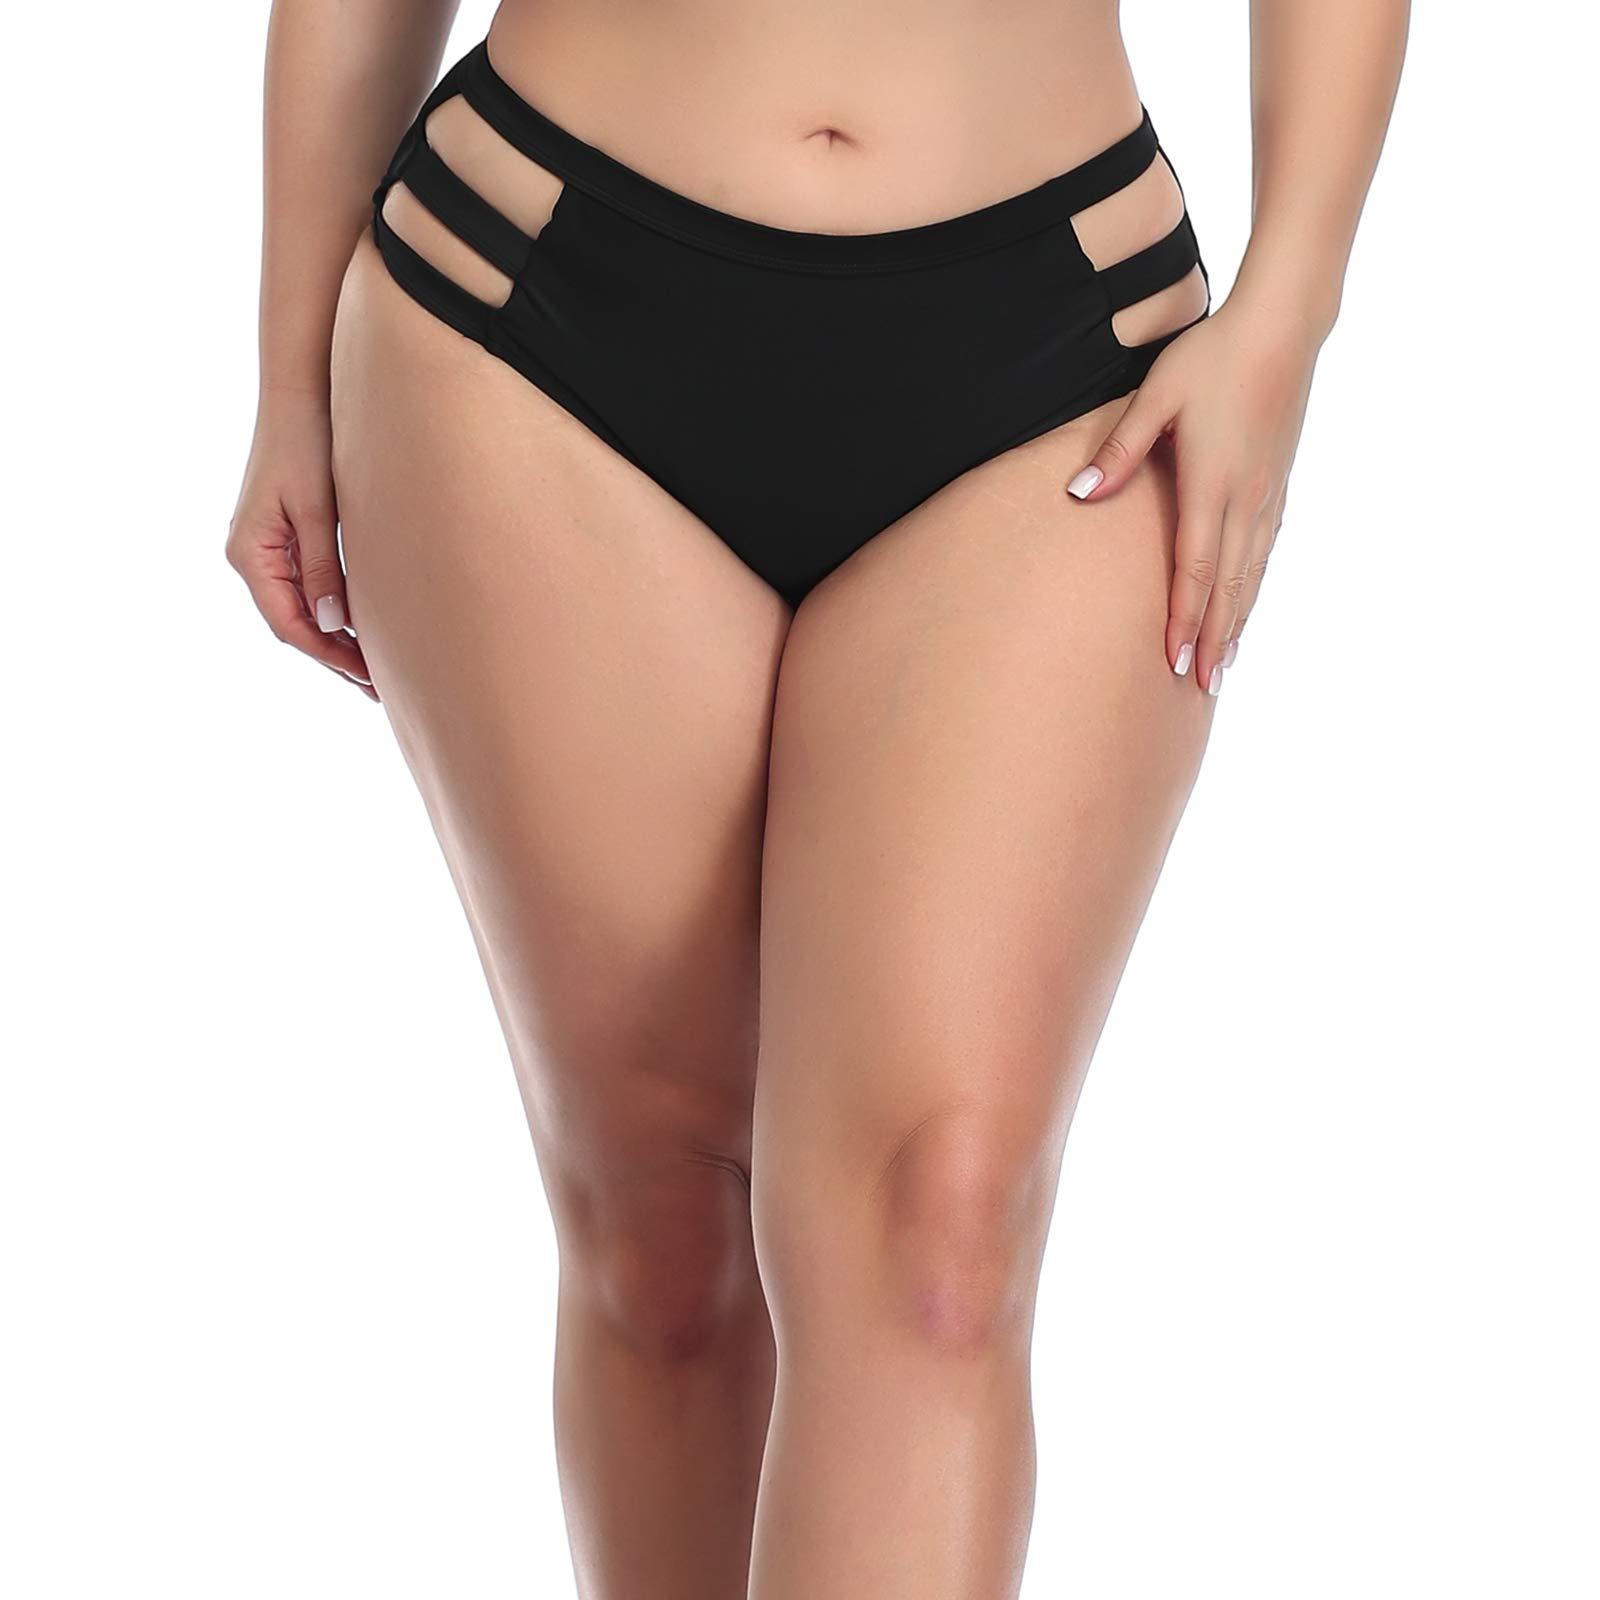 ZOHAMUNG Beach Pant Swimsuit Women Brazilian Cheeky Ruched Adjustable Tie Bikini Yoga Running Shorts Bottoms